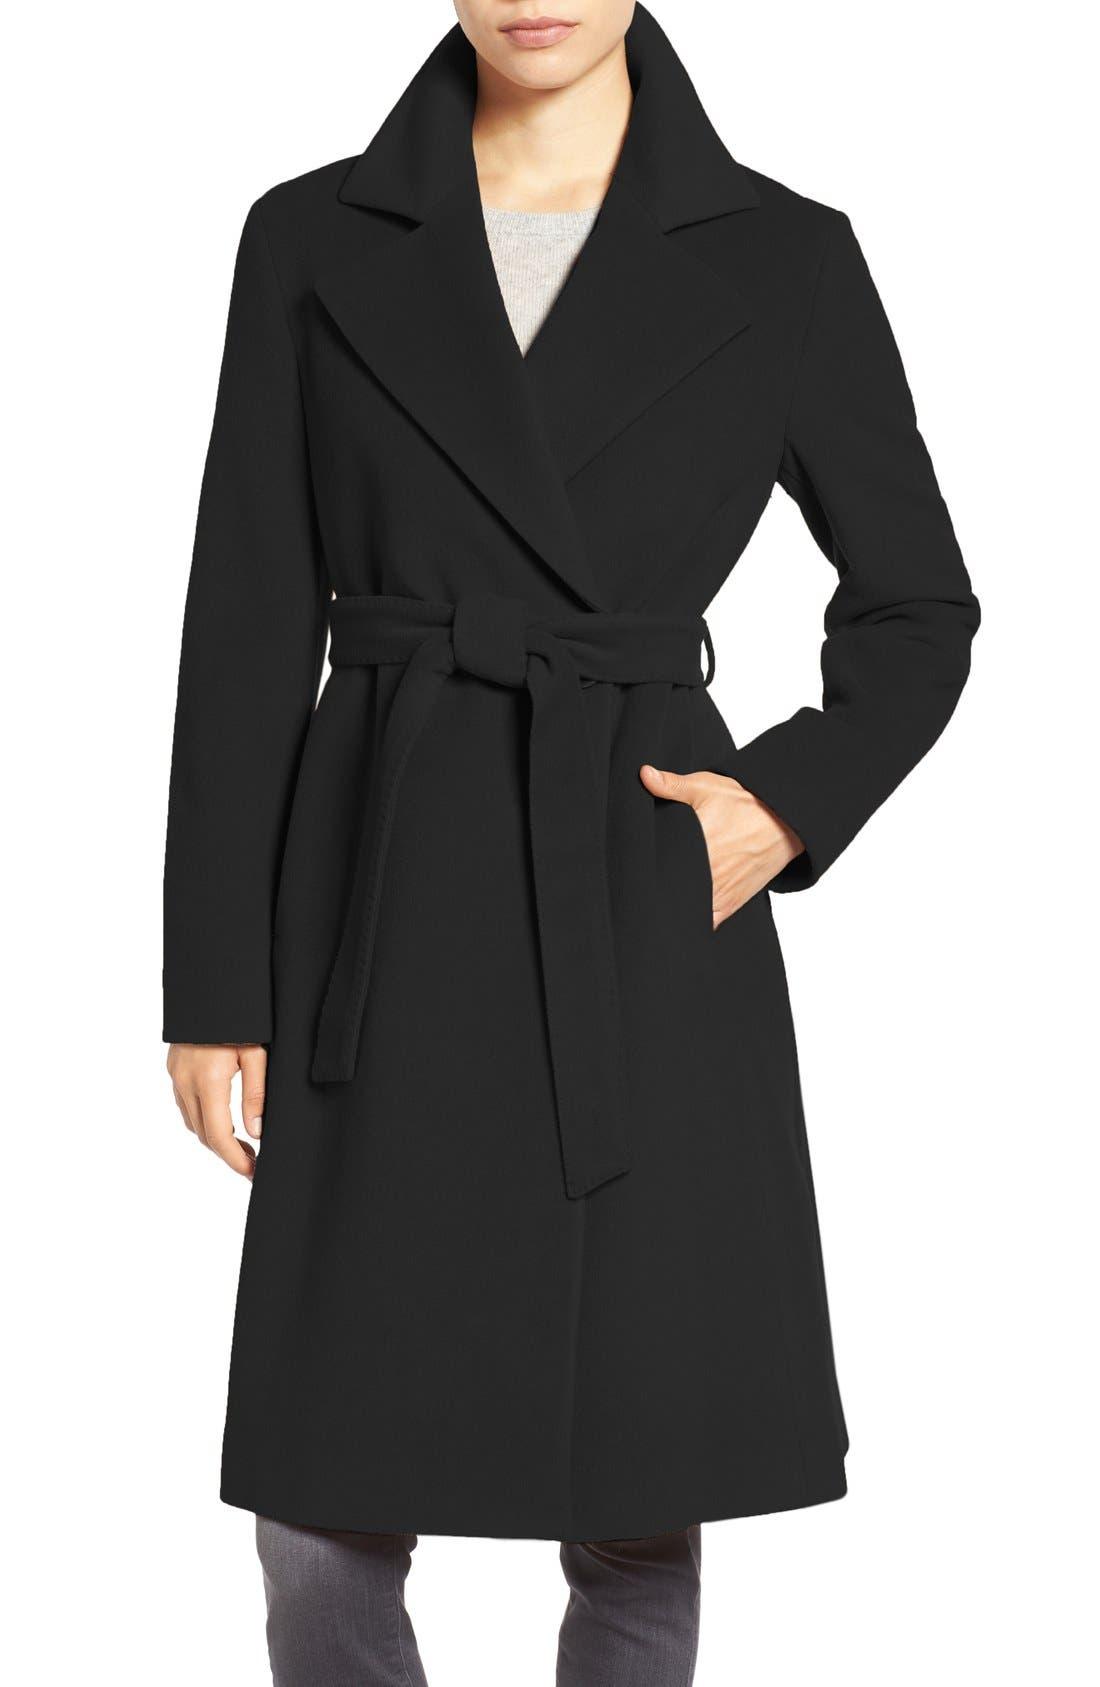 Alternate Image 1 Selected - Cinzia Rocca Icons Wool Blend Long Wrap Coat (Regular & Petite)